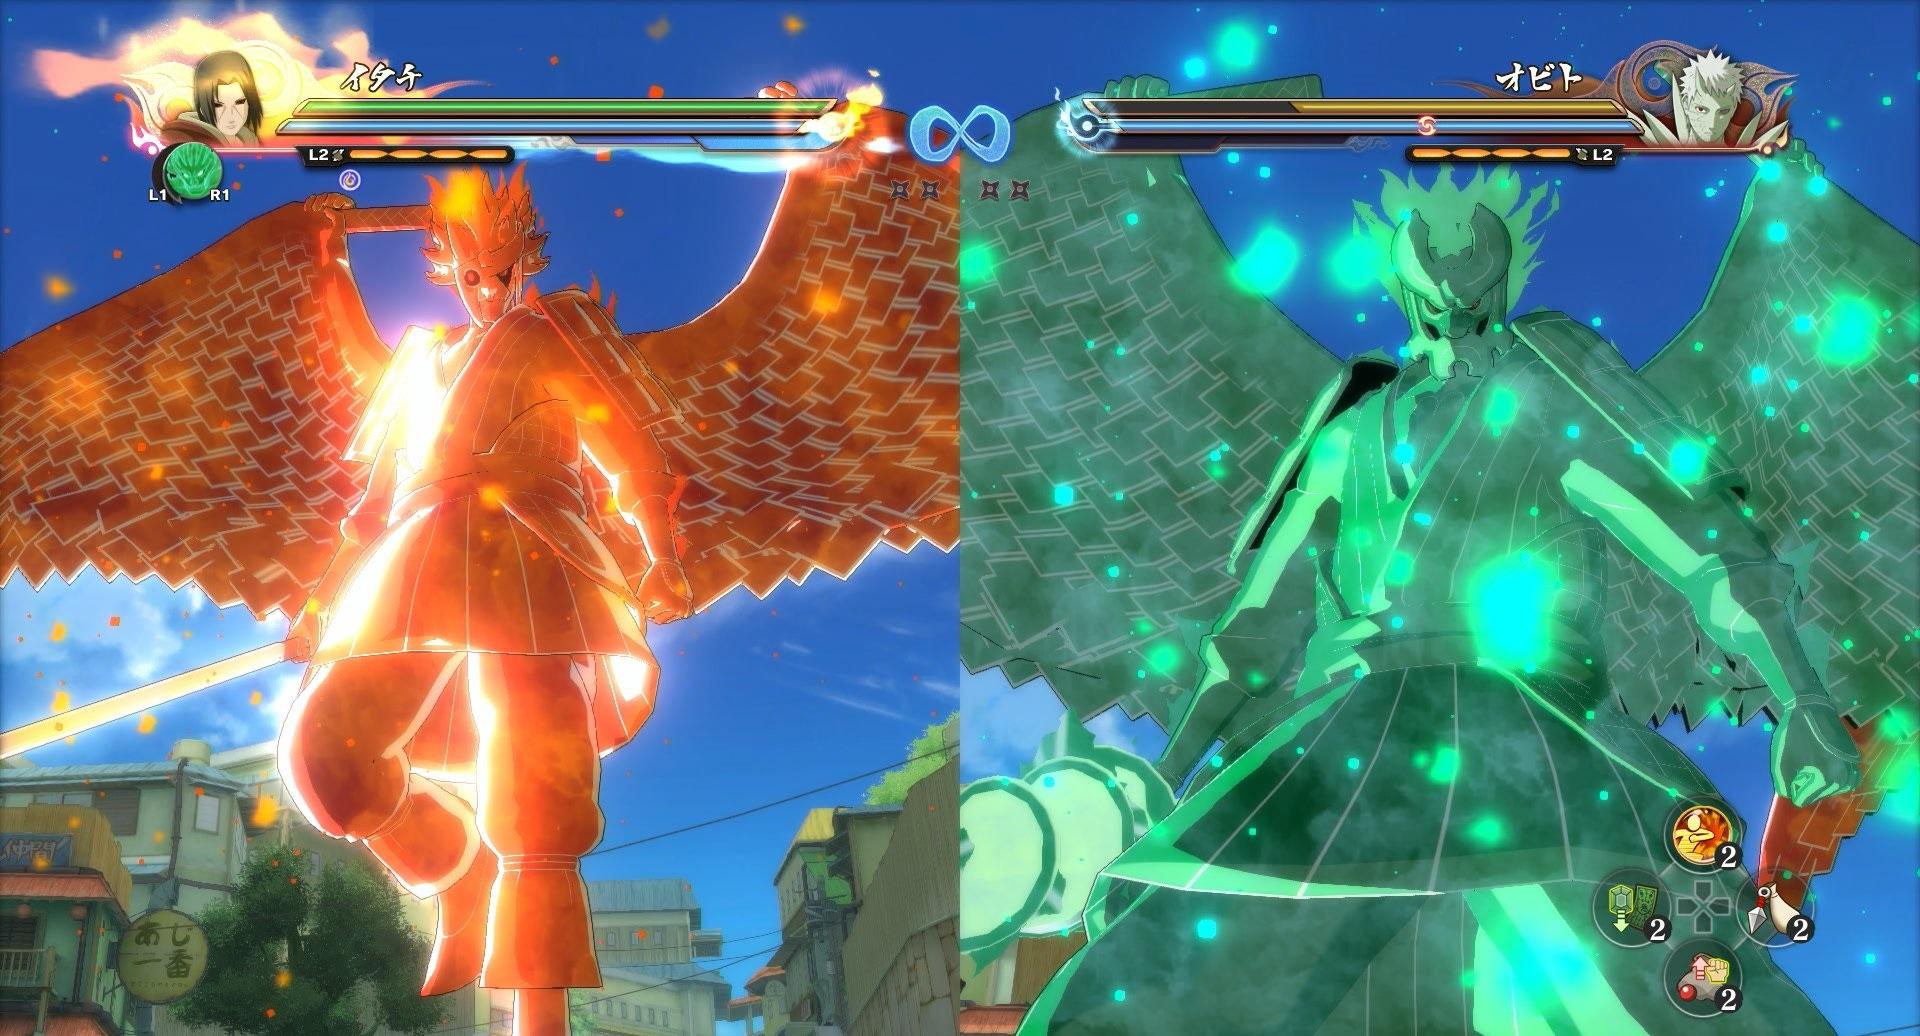 Naruto-Storm-4-4 Naruto Storm 4:Mükemmel Susanoo Shisui ve Itachi Ekran Görüntüleri